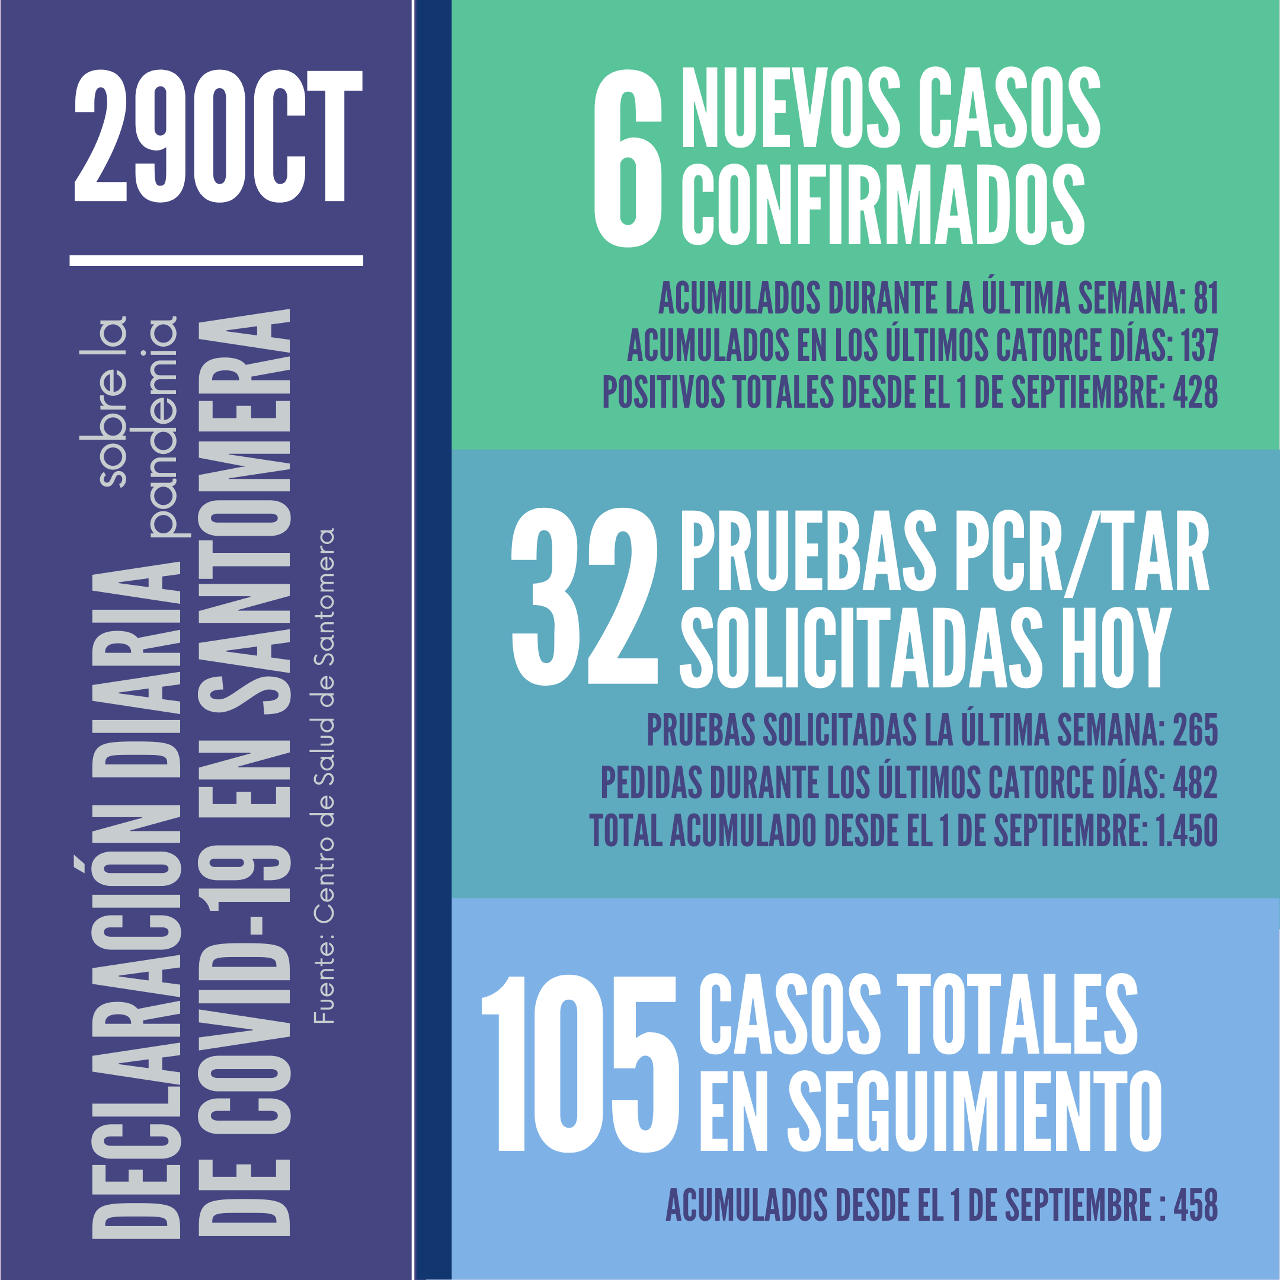 20201029_Datos COVID-19 Santomera